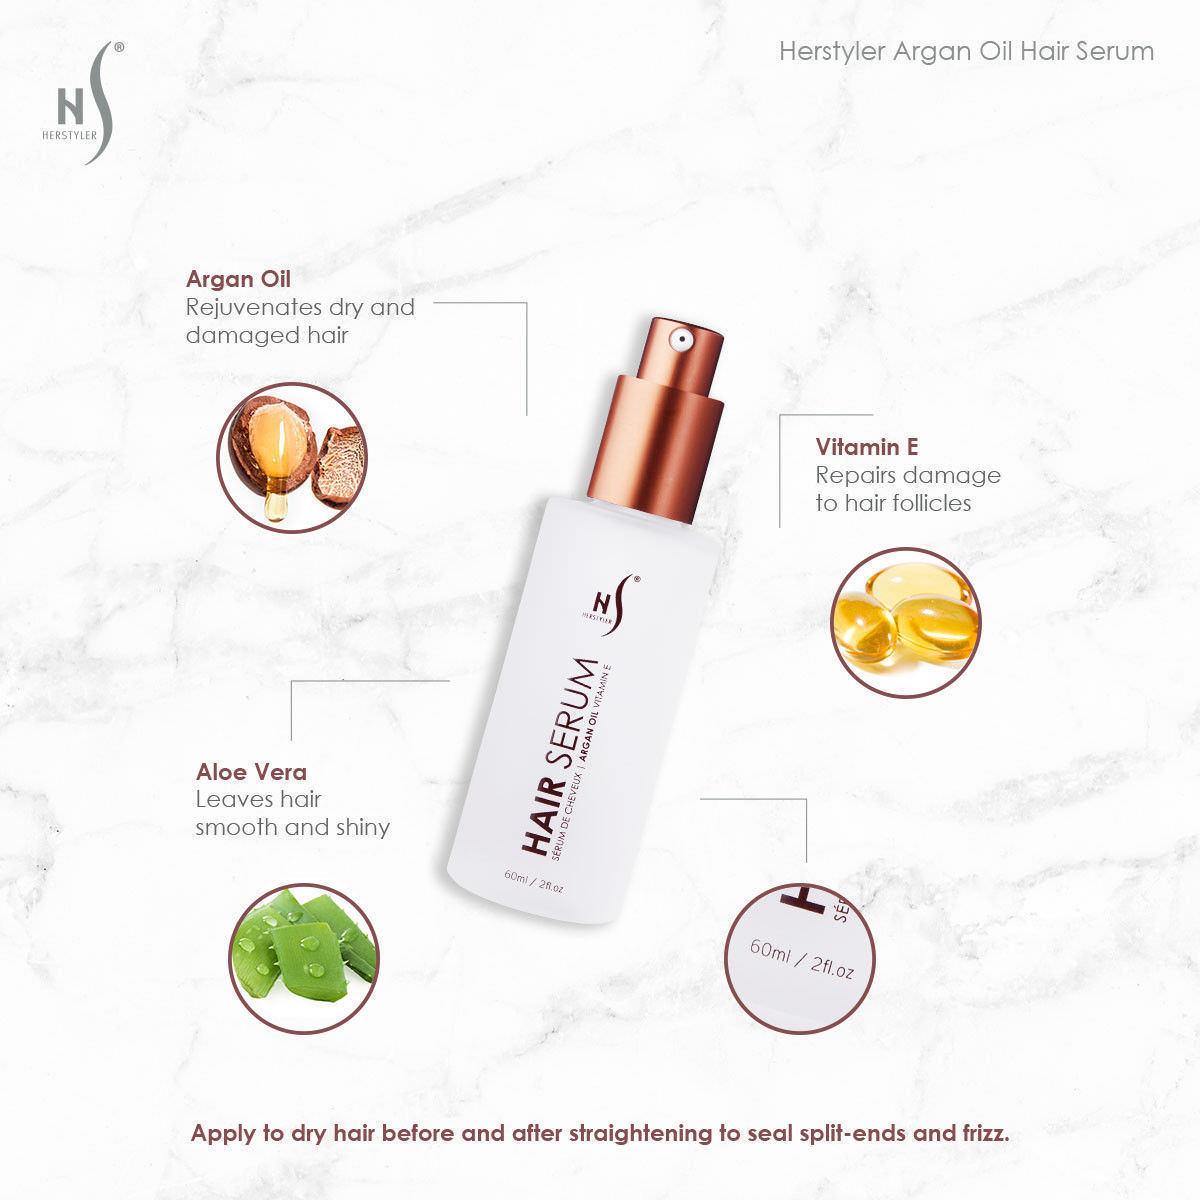 Herstyler Hair Serum with Argan Oil and Aloe Vera 2 fl oz / 60 m ( Pack of 4)